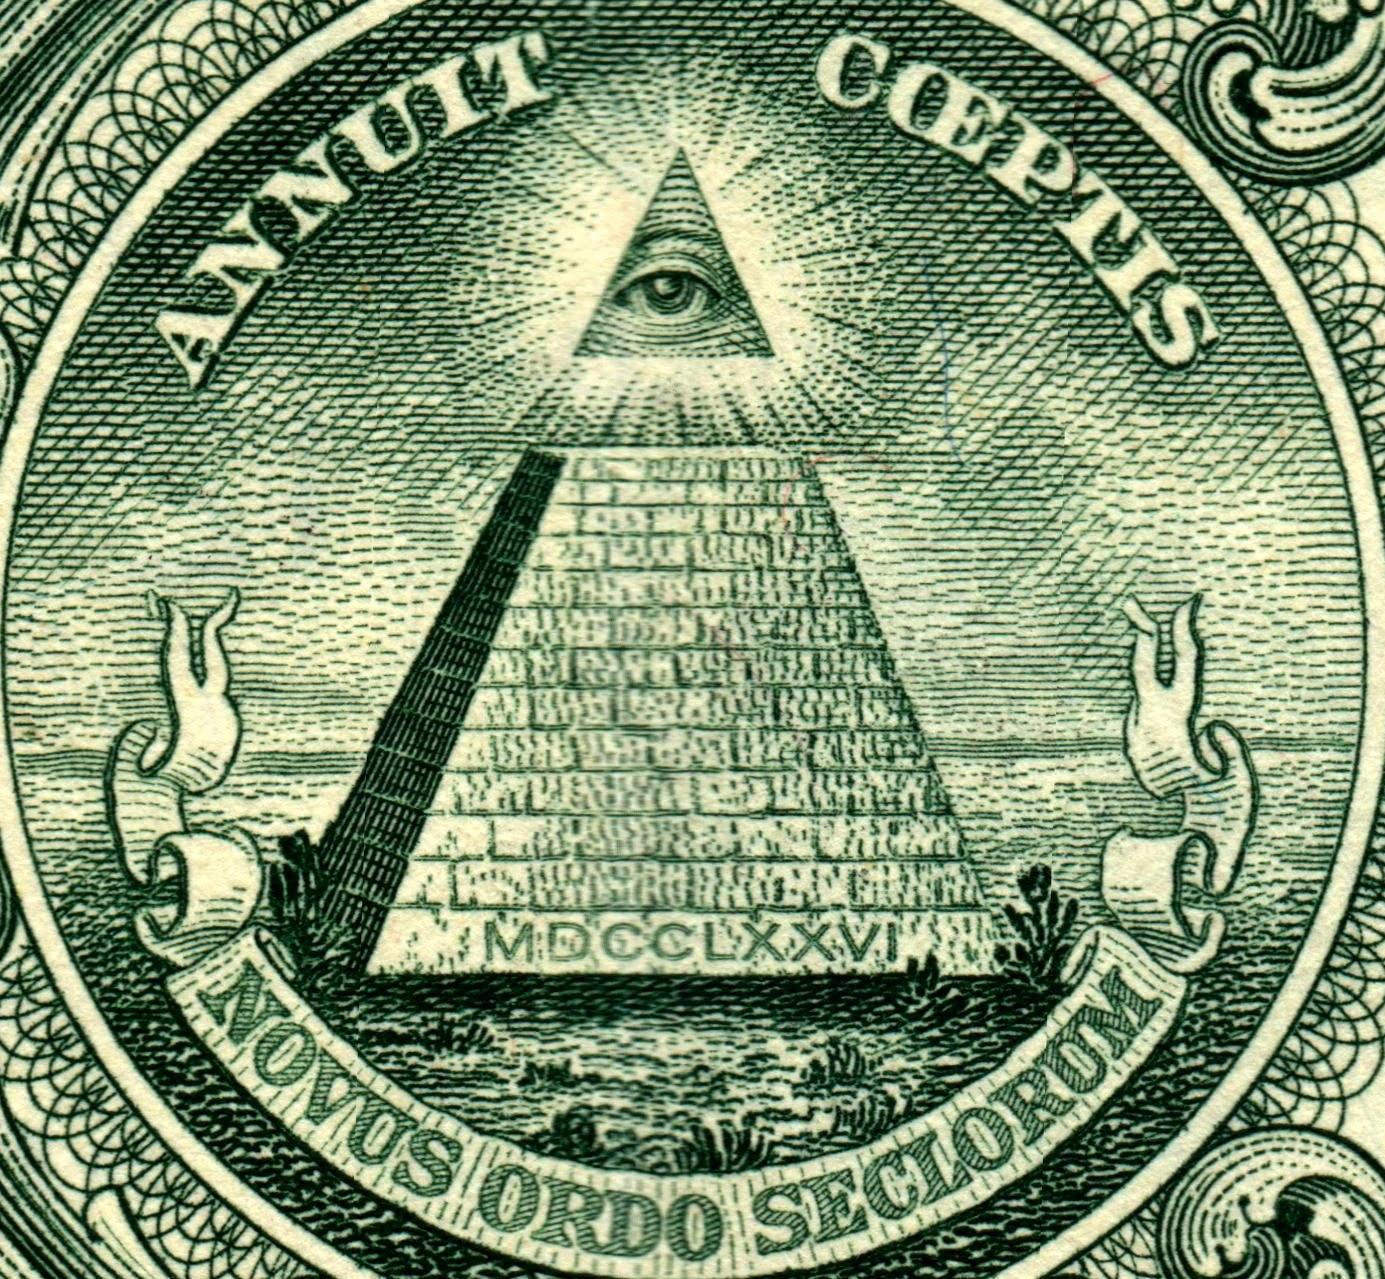 http://2.bp.blogspot.com/-4hnbsAAXZPM/Uqg-Rv2ZAYI/AAAAAAAACI8/nRLixqsdKRk/s1600/one-dollar-pyramidcrop.jpg